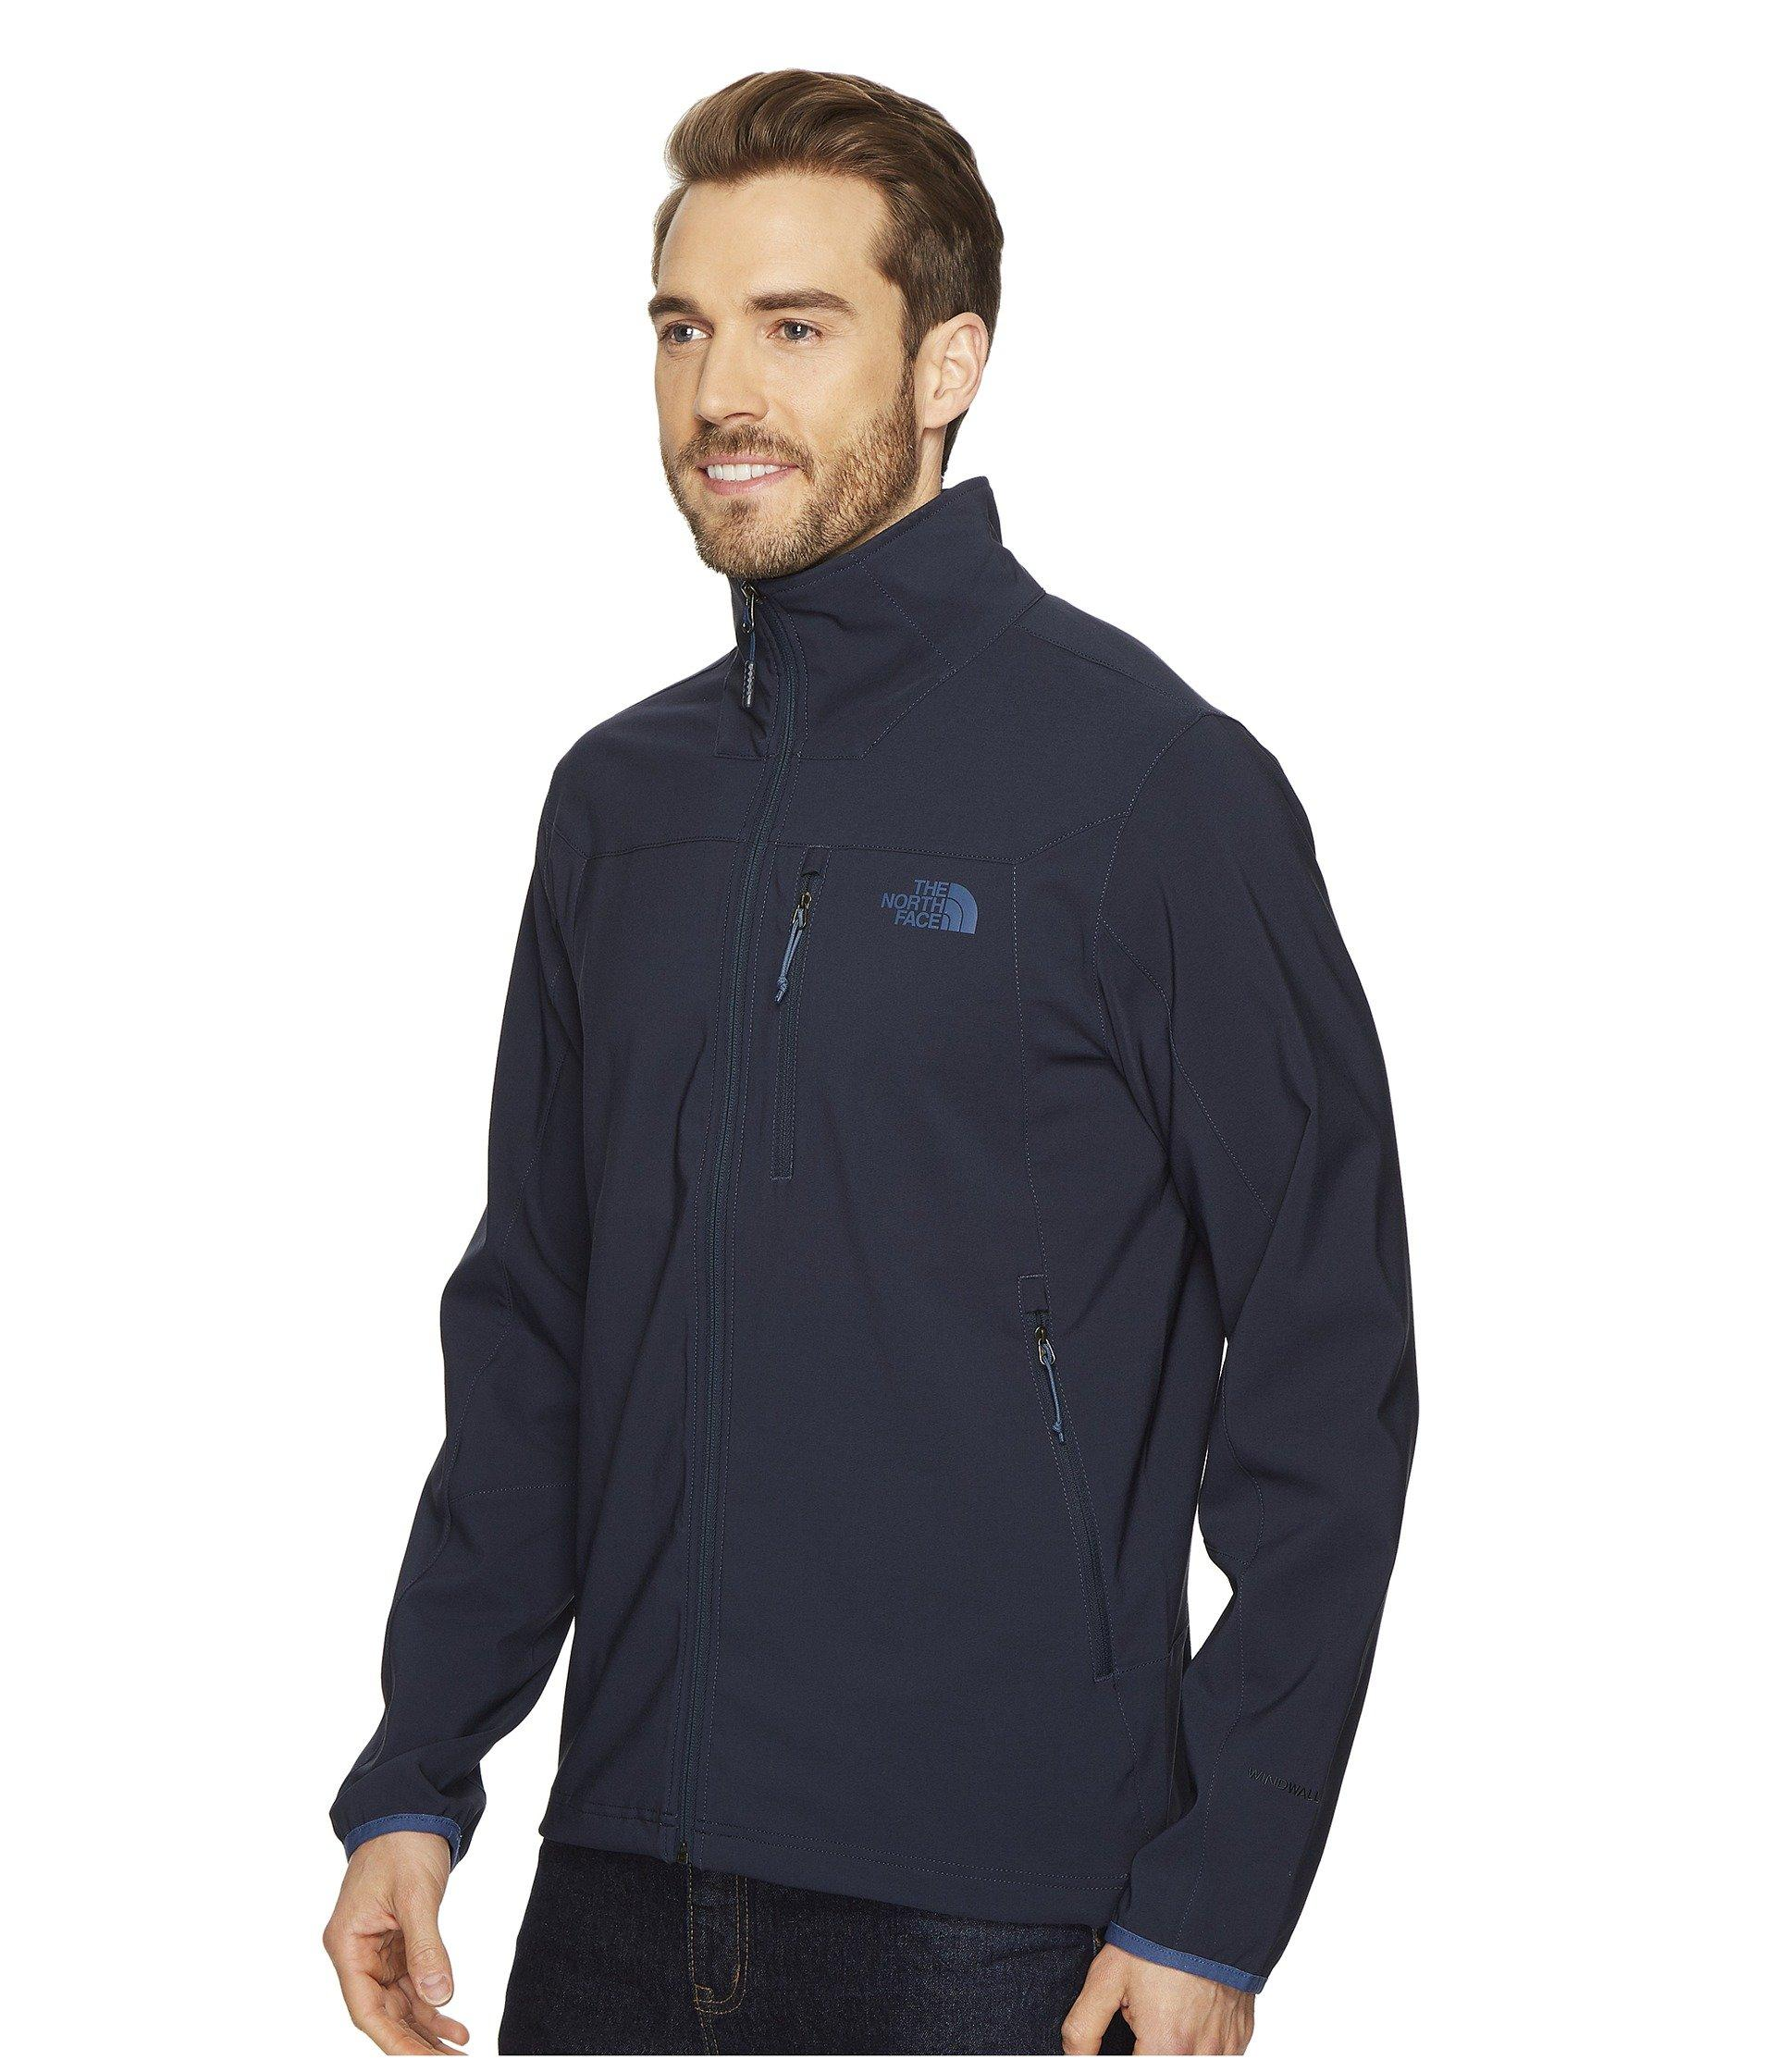 671f5bb67 Men's Blue Apex Nimble Jacket